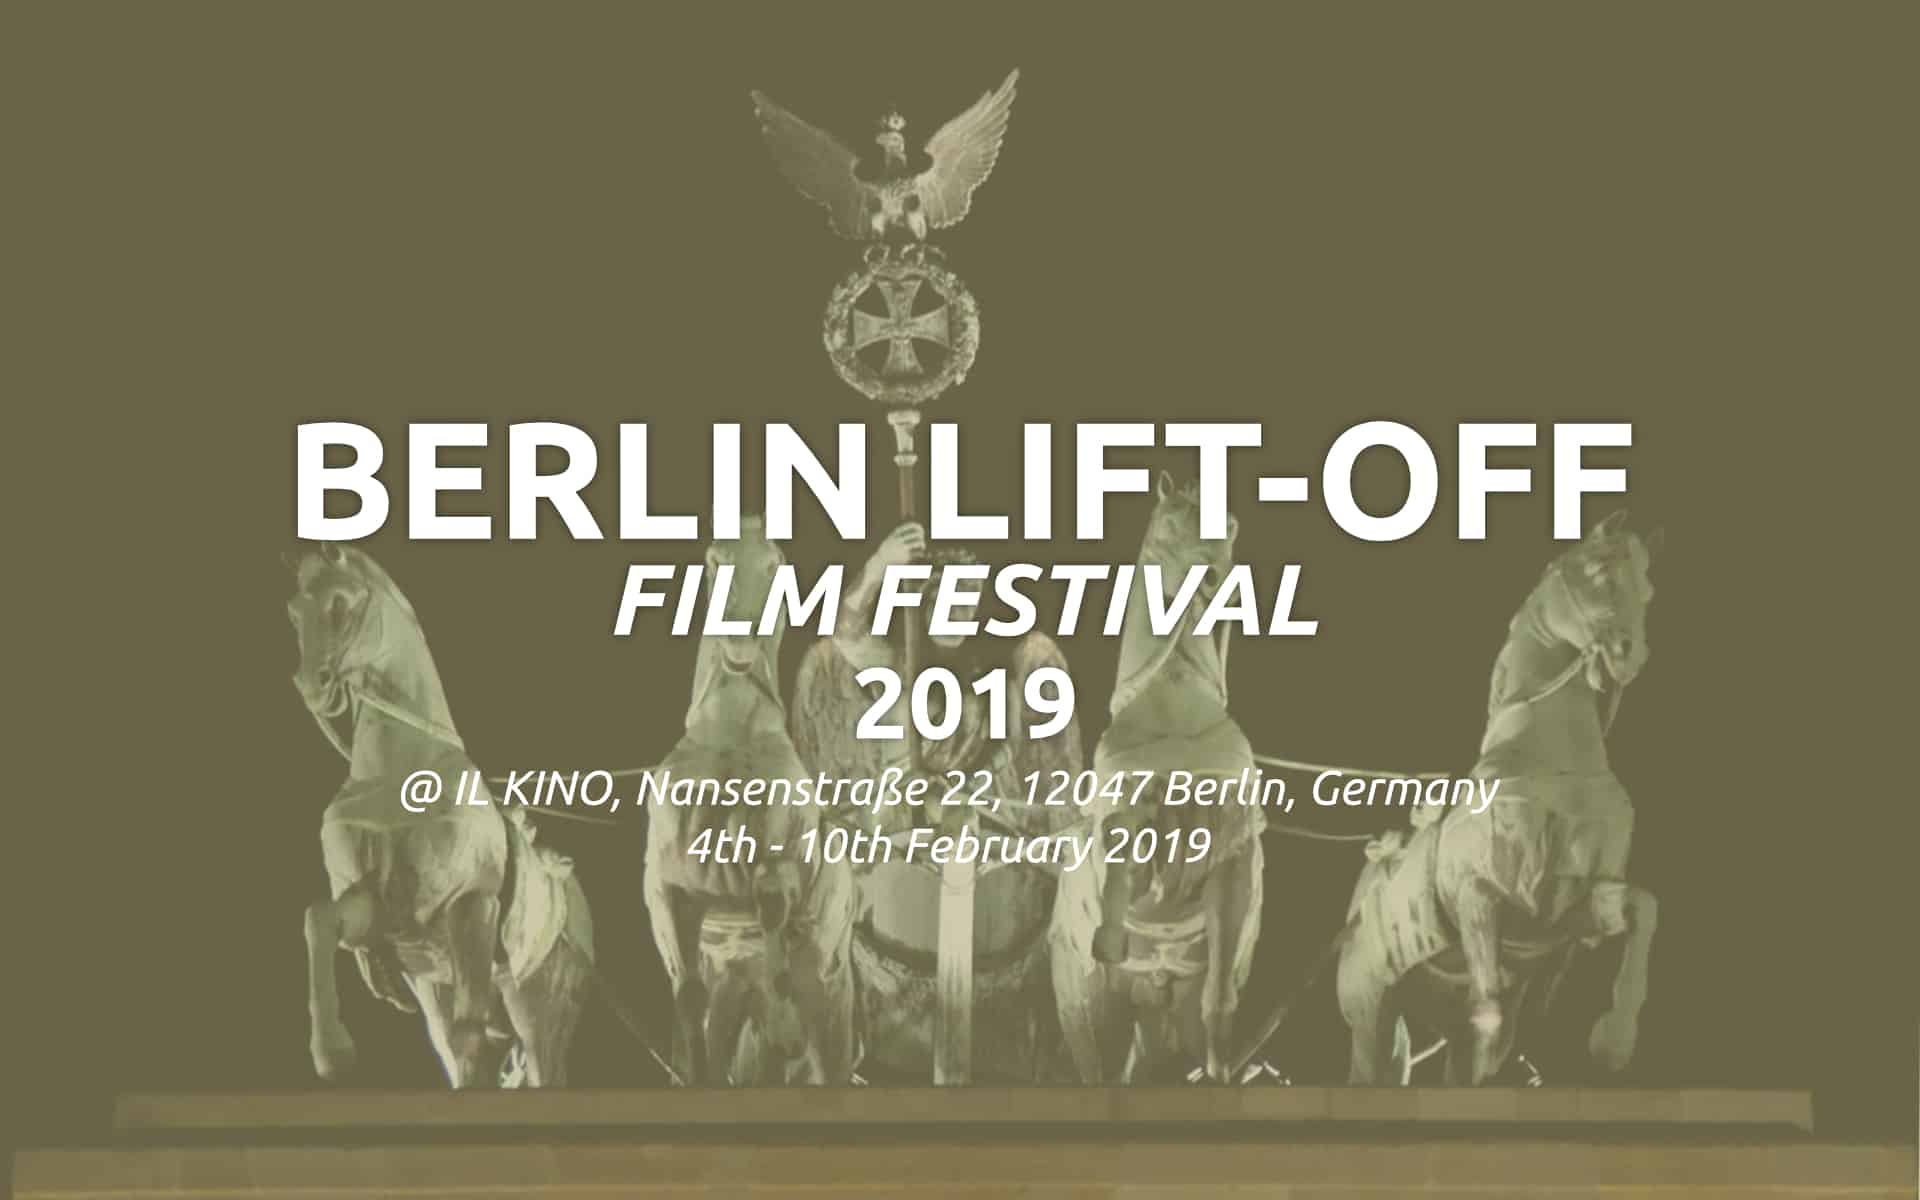 Event kino 47 berlin